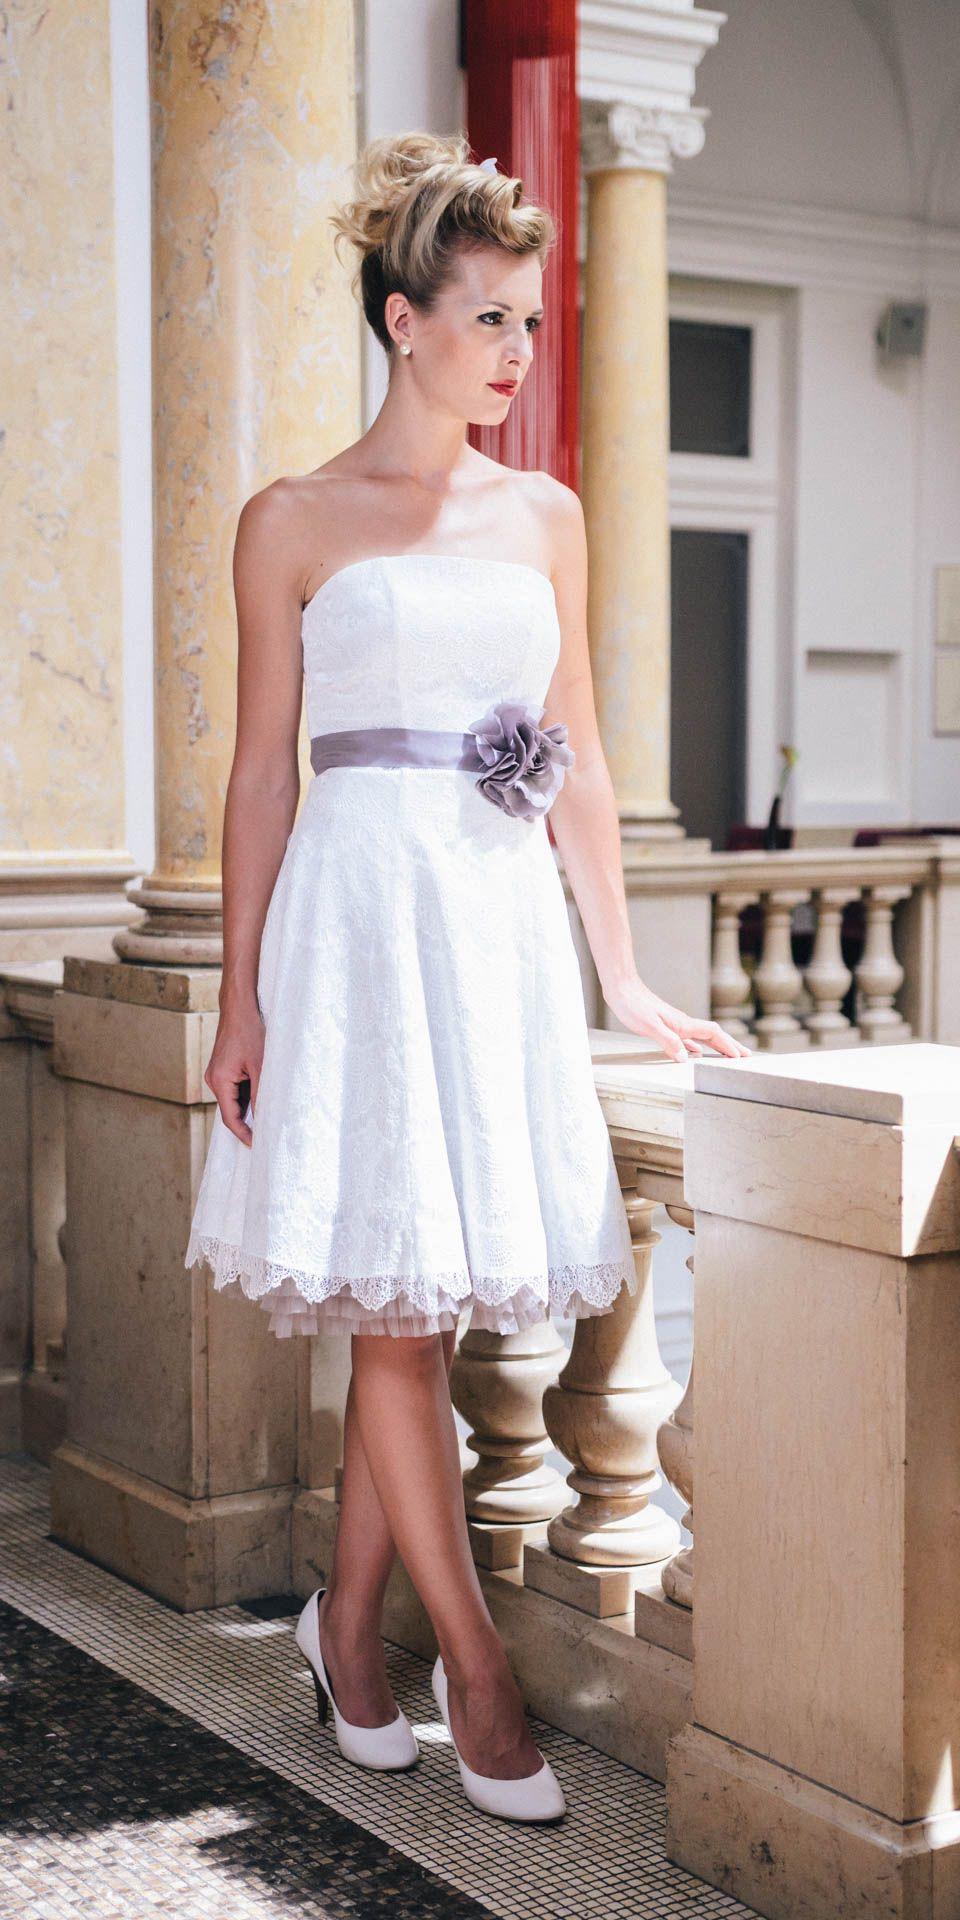 Brautkleid Petticoat – unsere Katy stimmig mit Petticoat ...